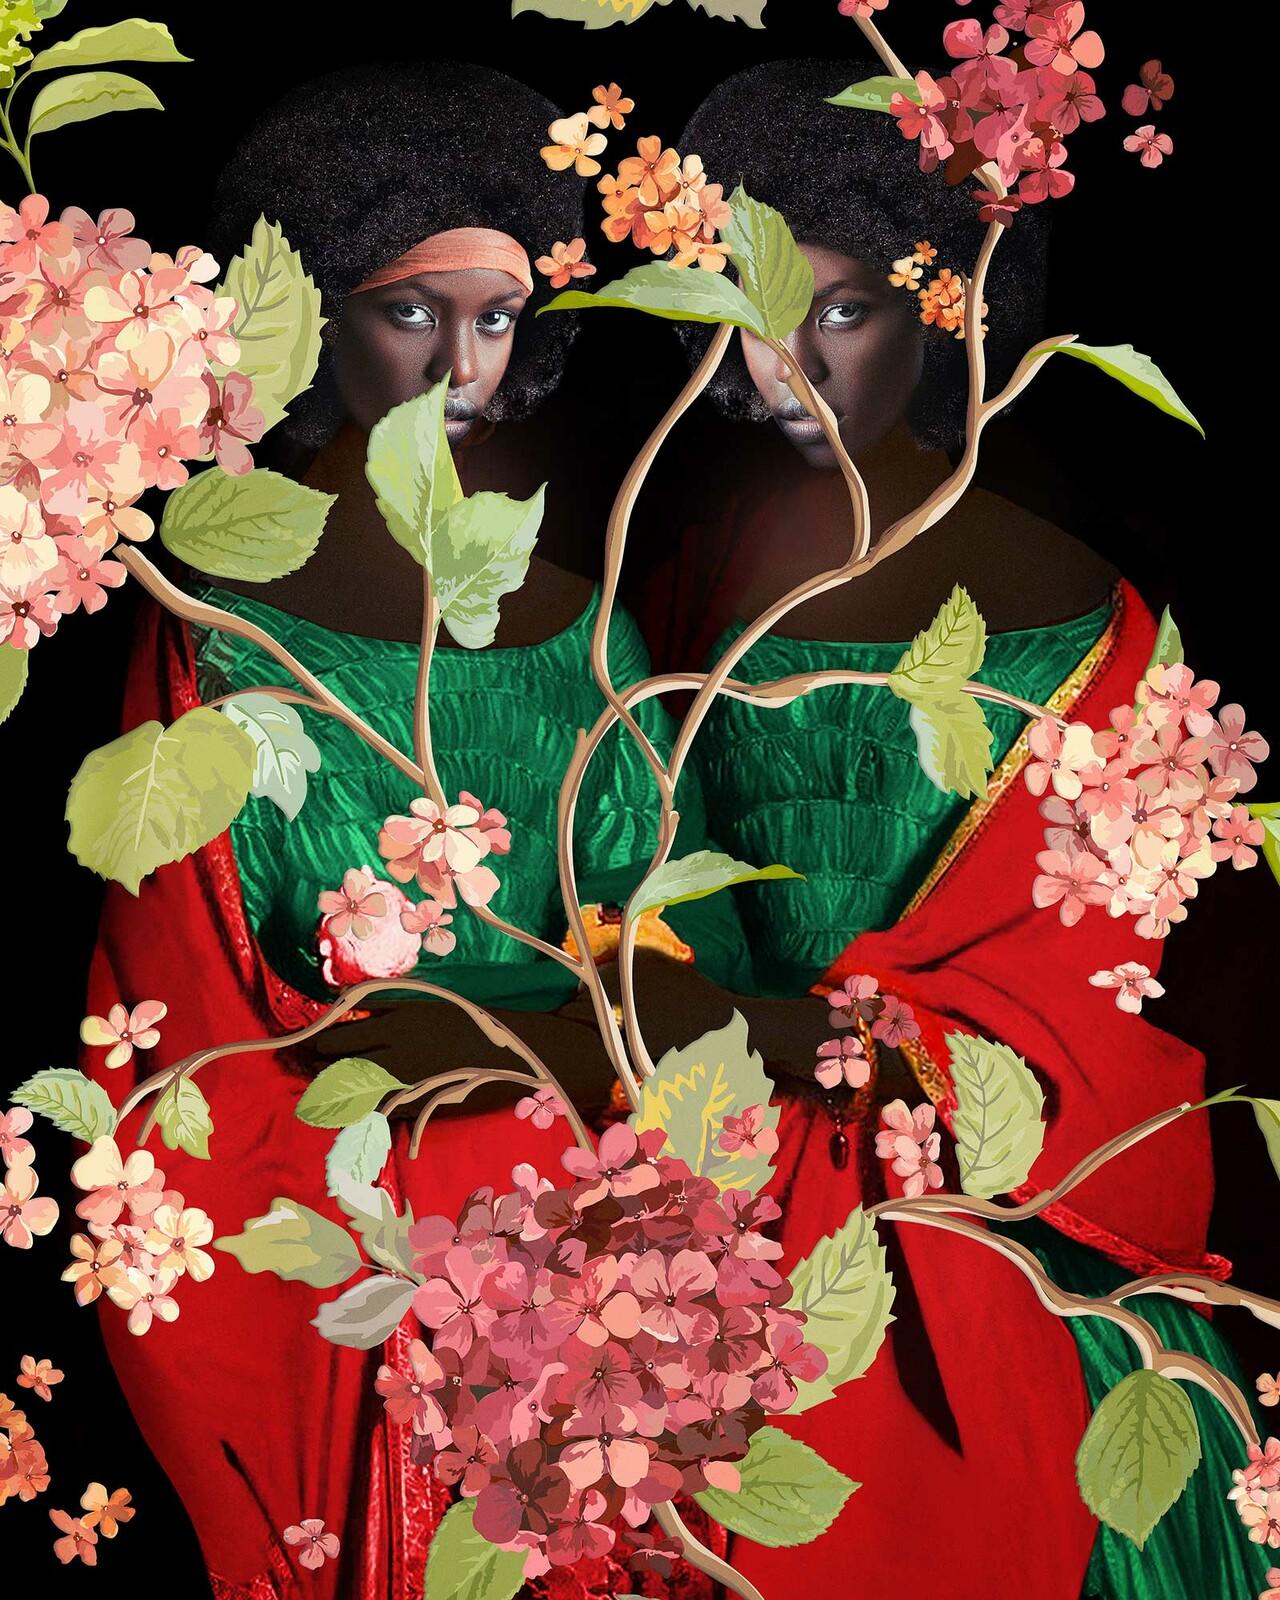 Black Twins - Rachel Witzman